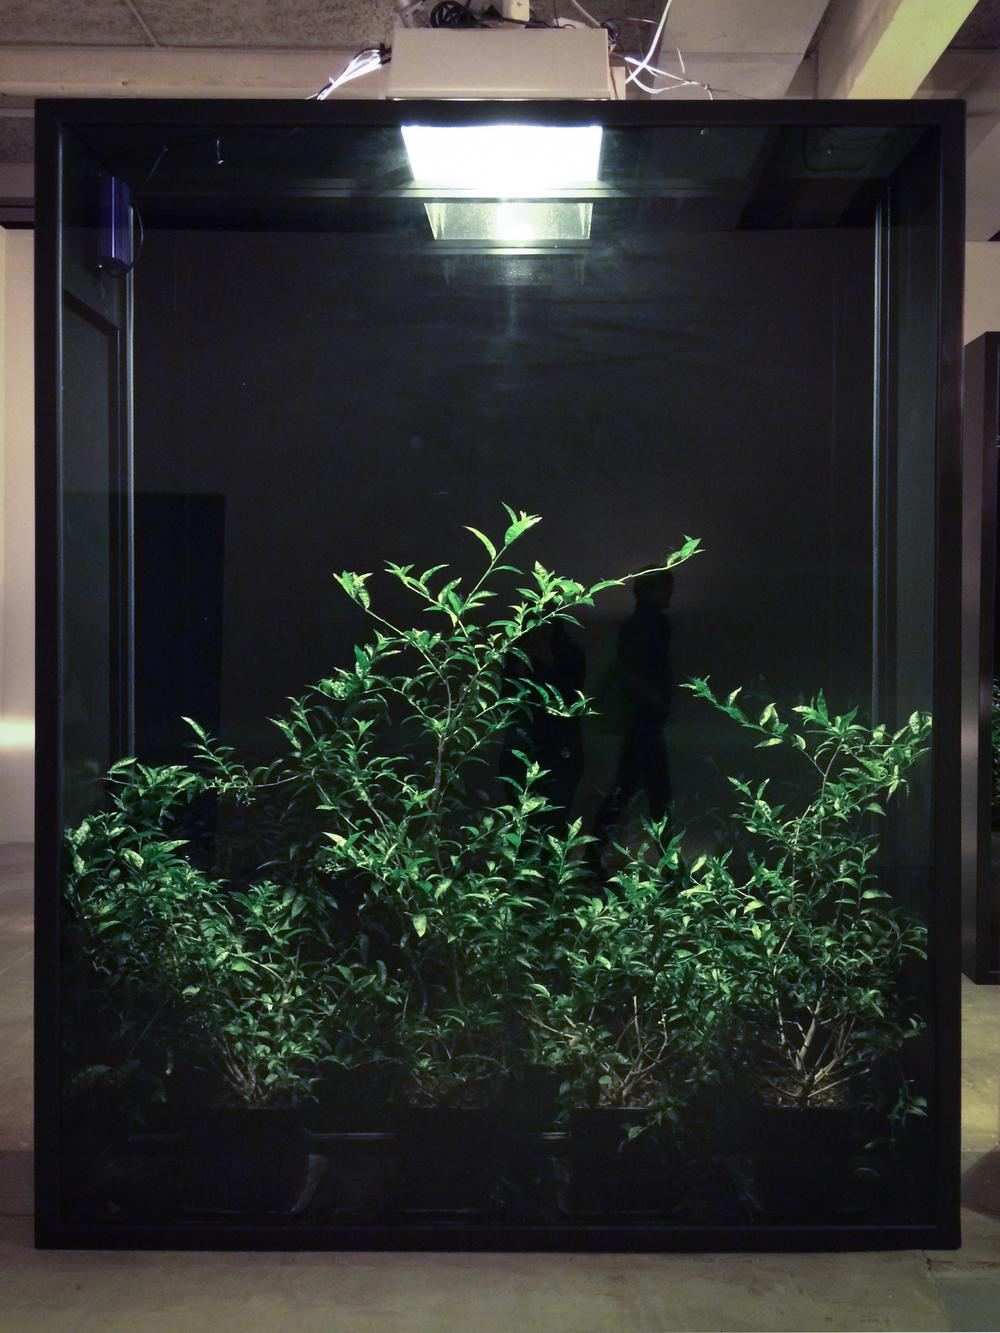 Hicham Berrada,Mesk-ellil,2015.Installation, ensemble of 7 stained glass terrariums, cestrum nocturnum, horticultural lighting, moonlight lighting delay.250 x 200 x 50 cm each,250 x 500 x 500 cm overall.Courtesy Kamel Mennour, Paris.